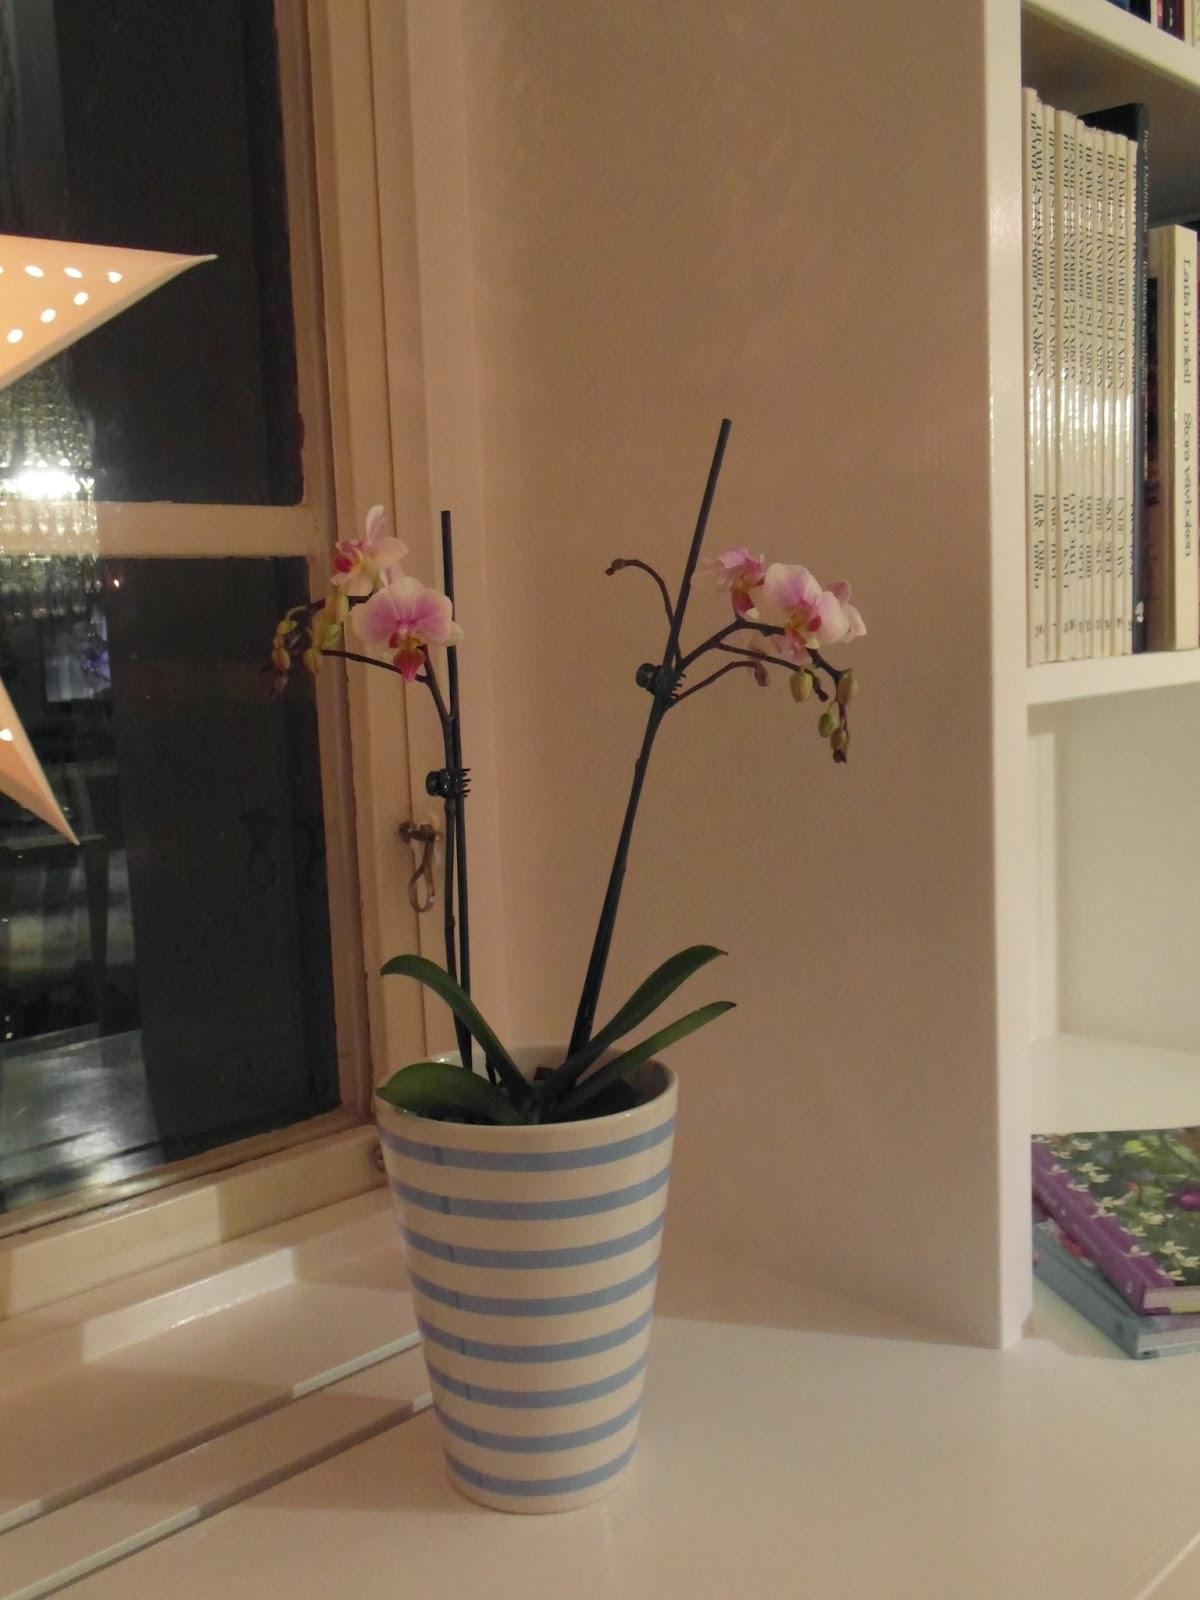 orkidé, kruka, julstjärna